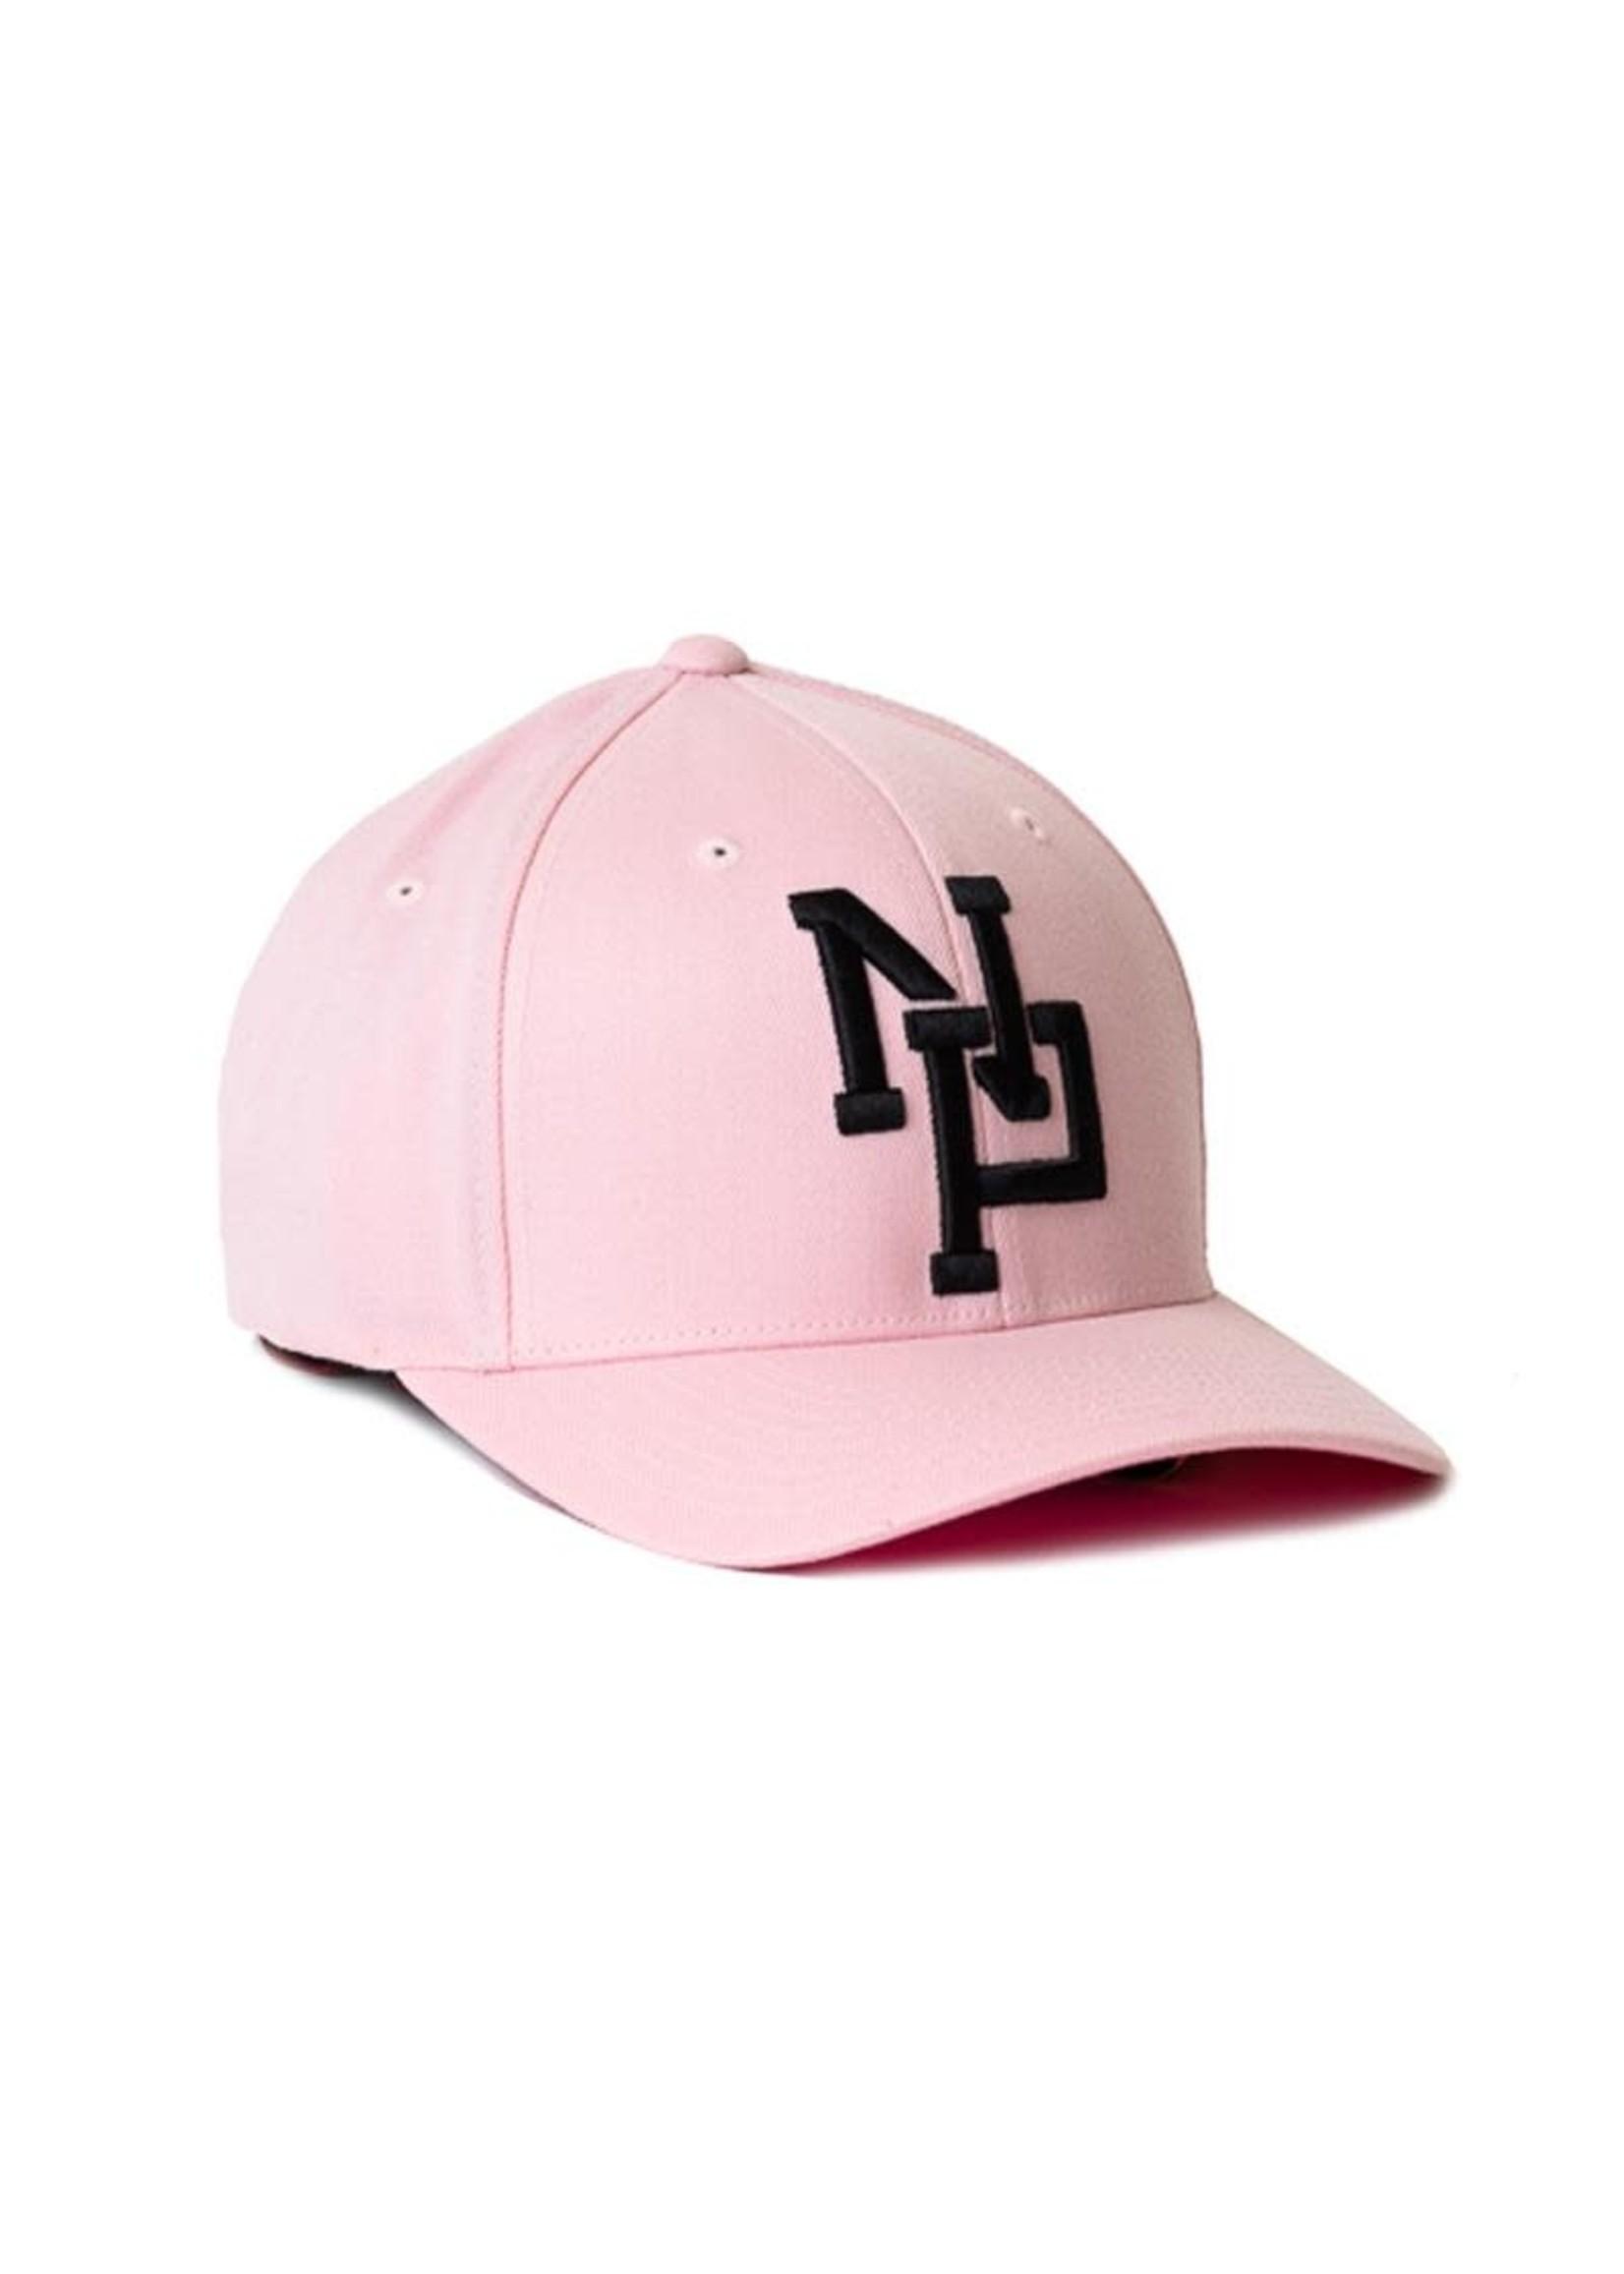 Nasty Pig Nasty Pig Interlock NP Cap